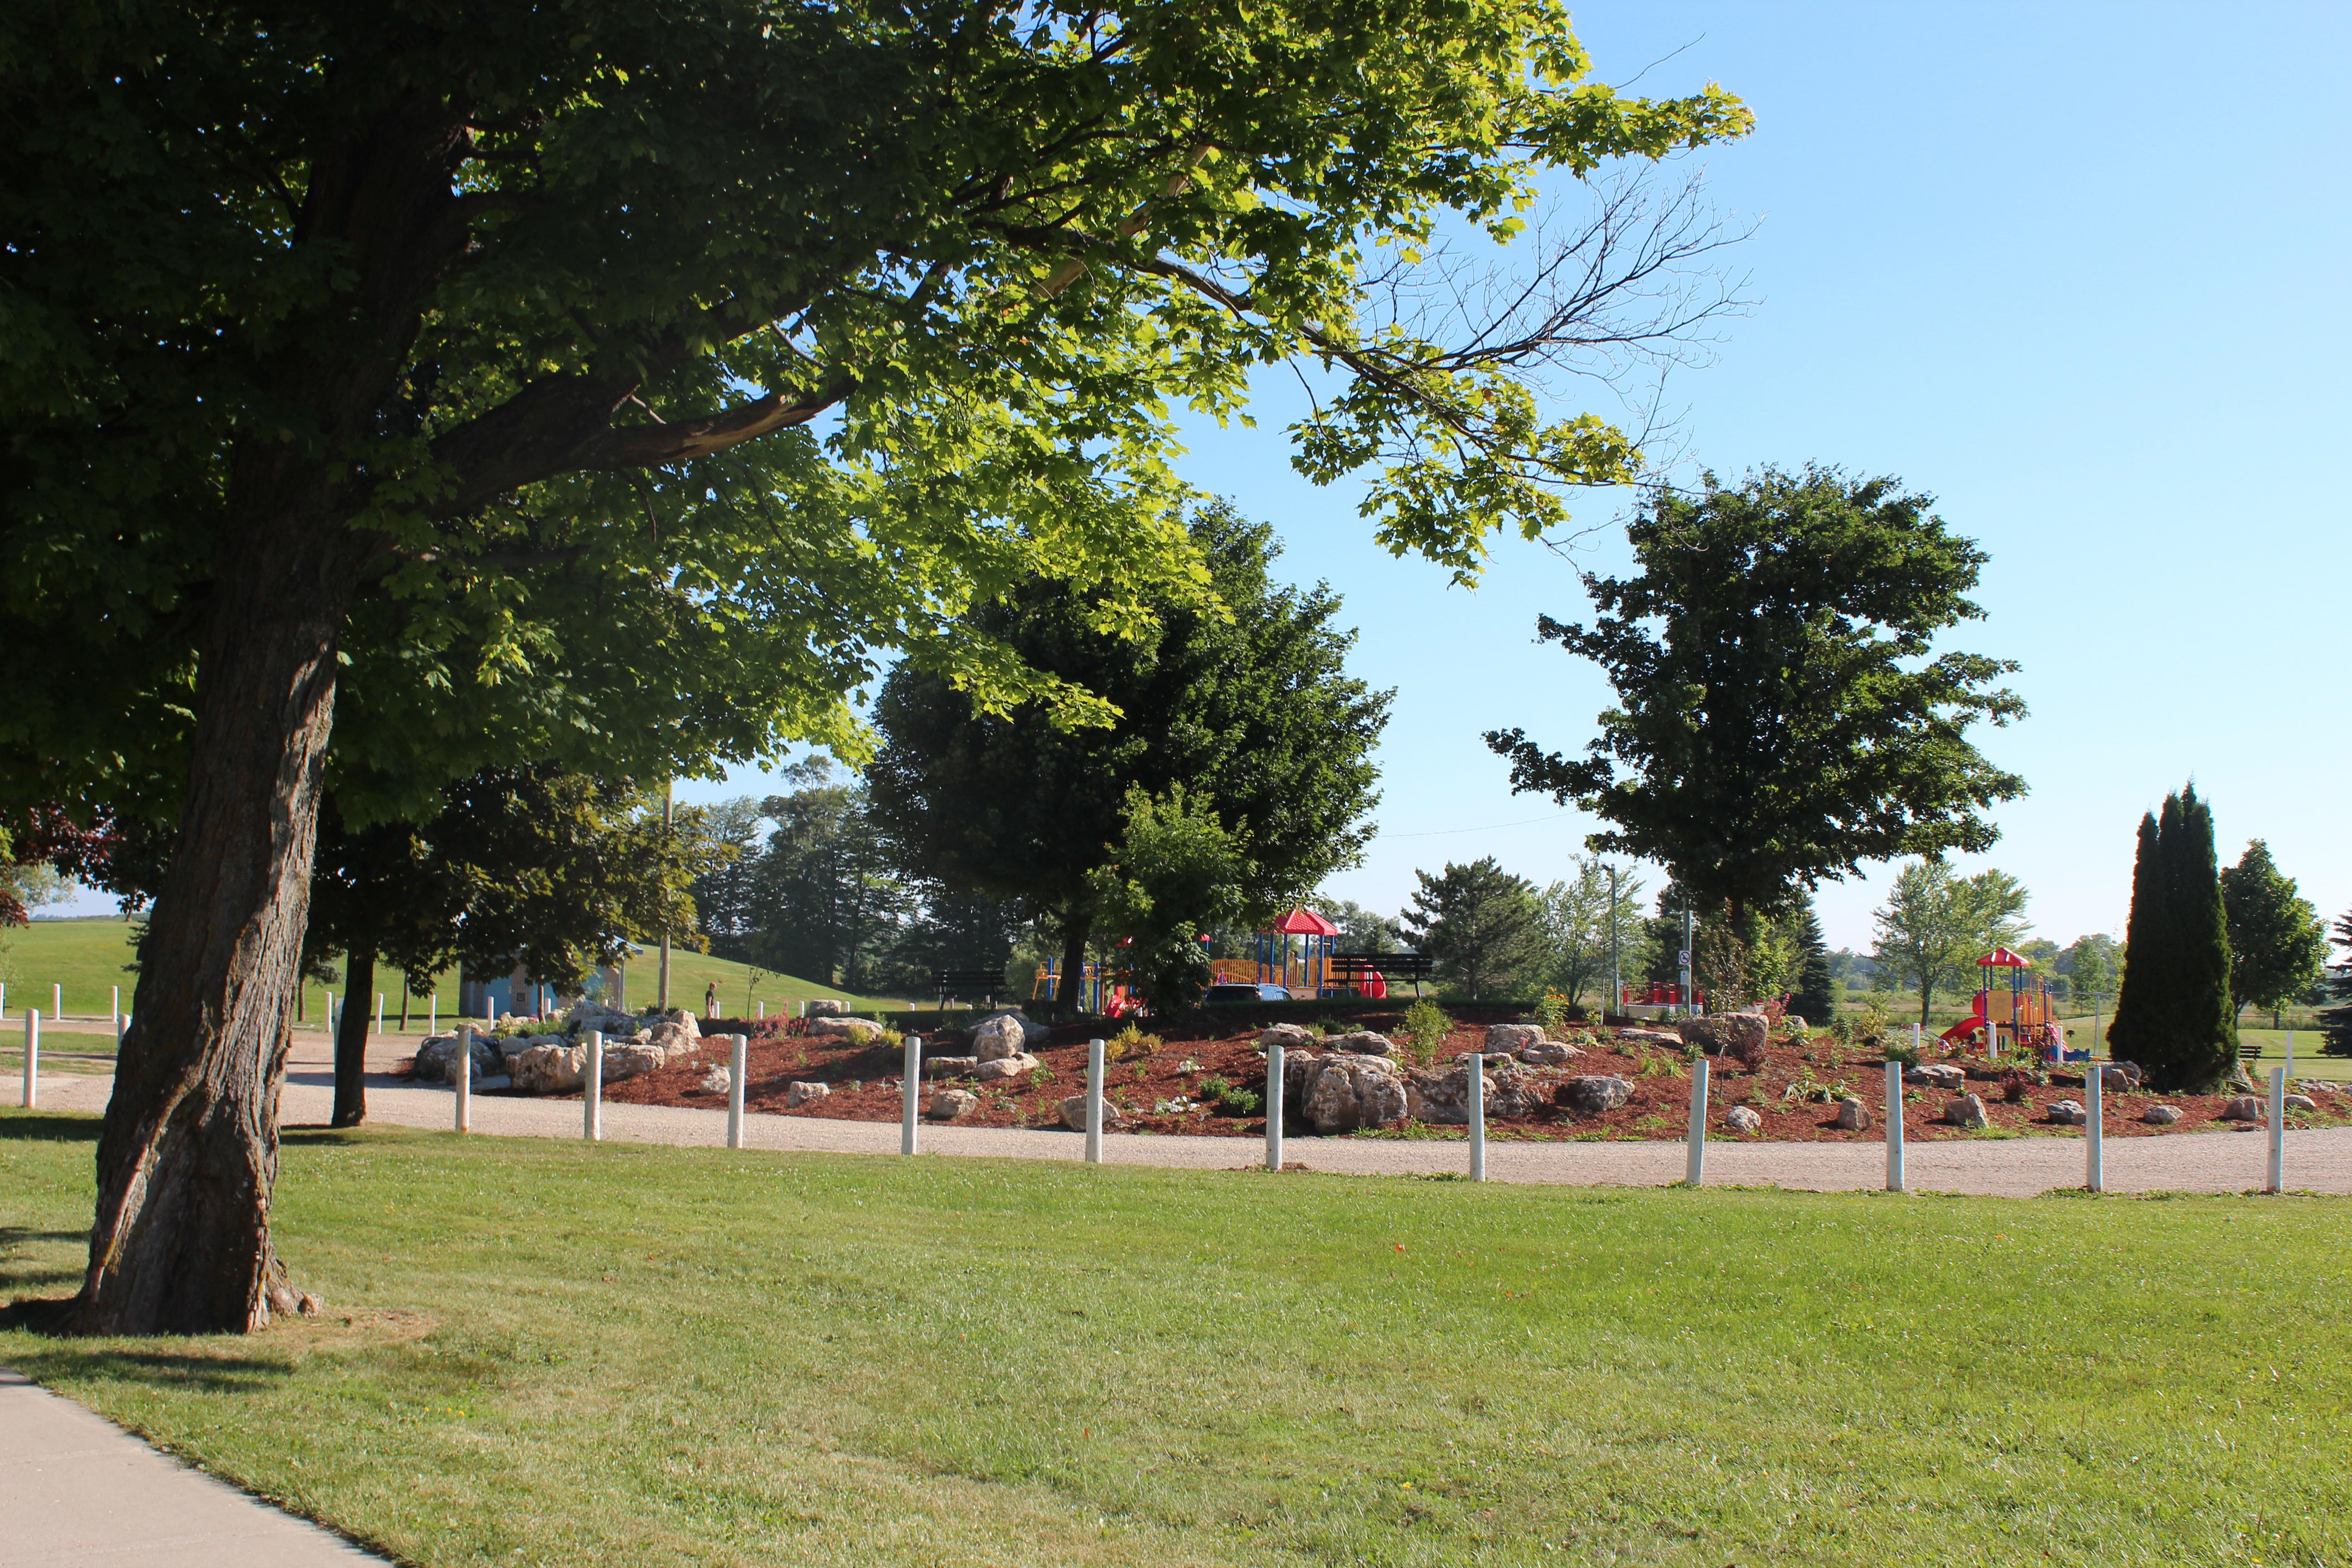 Image 21 - Greenwood Park.JPG